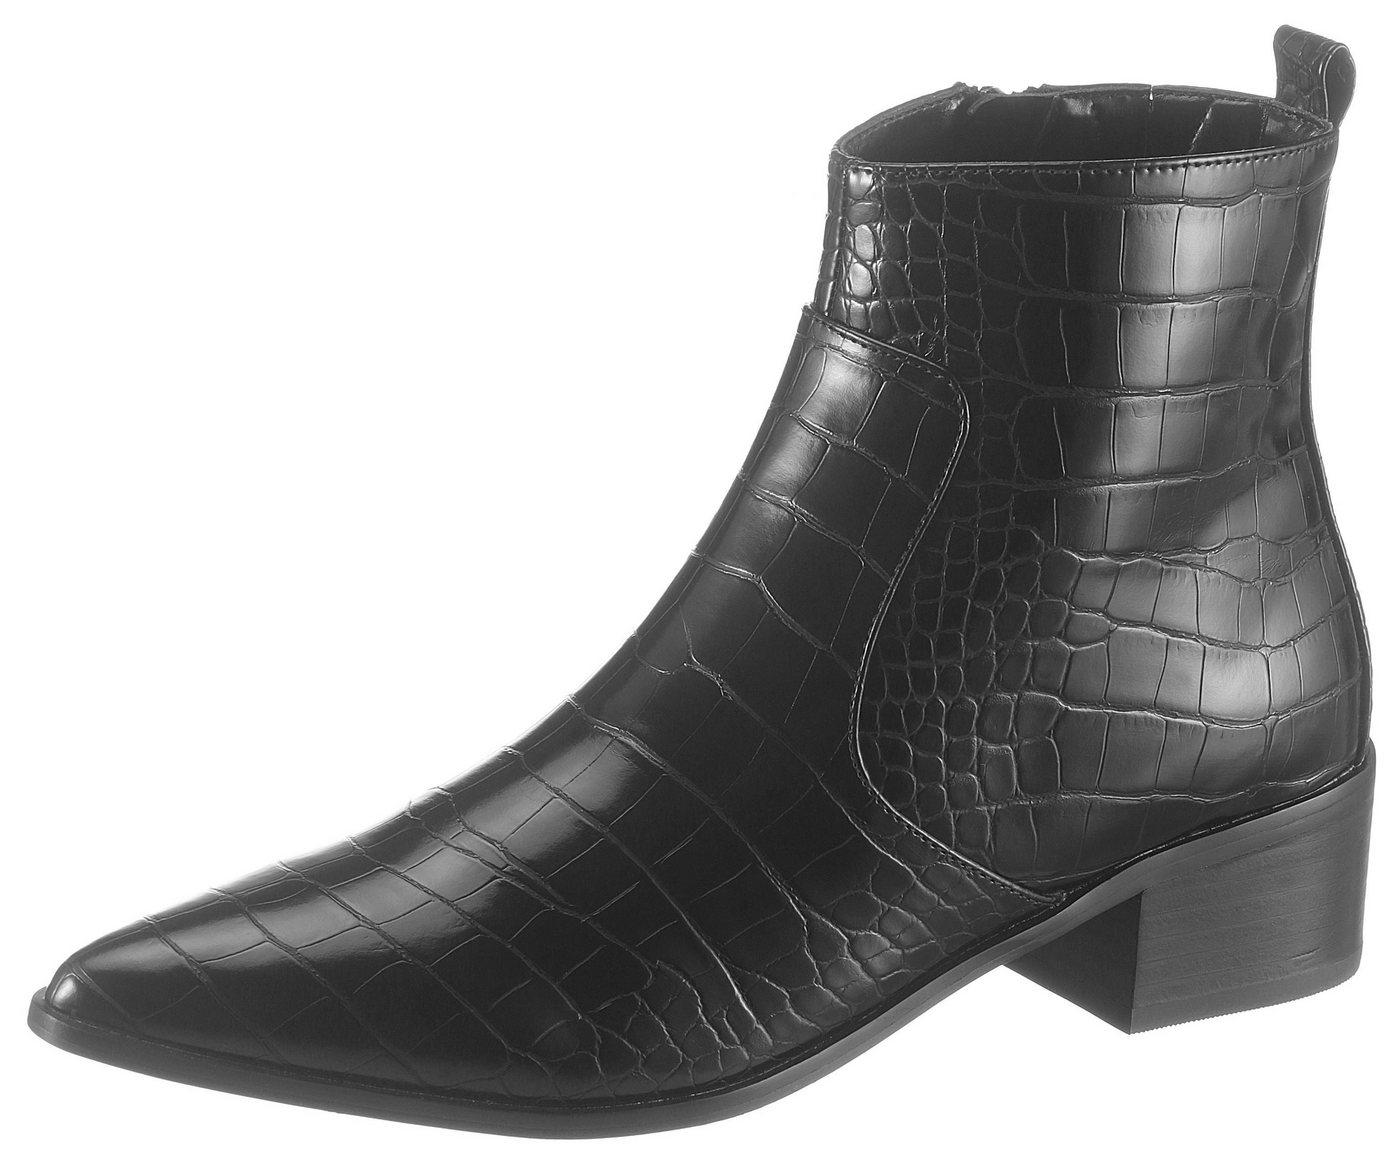 buffalo -  Ankleboots in spitz zulaufender Form